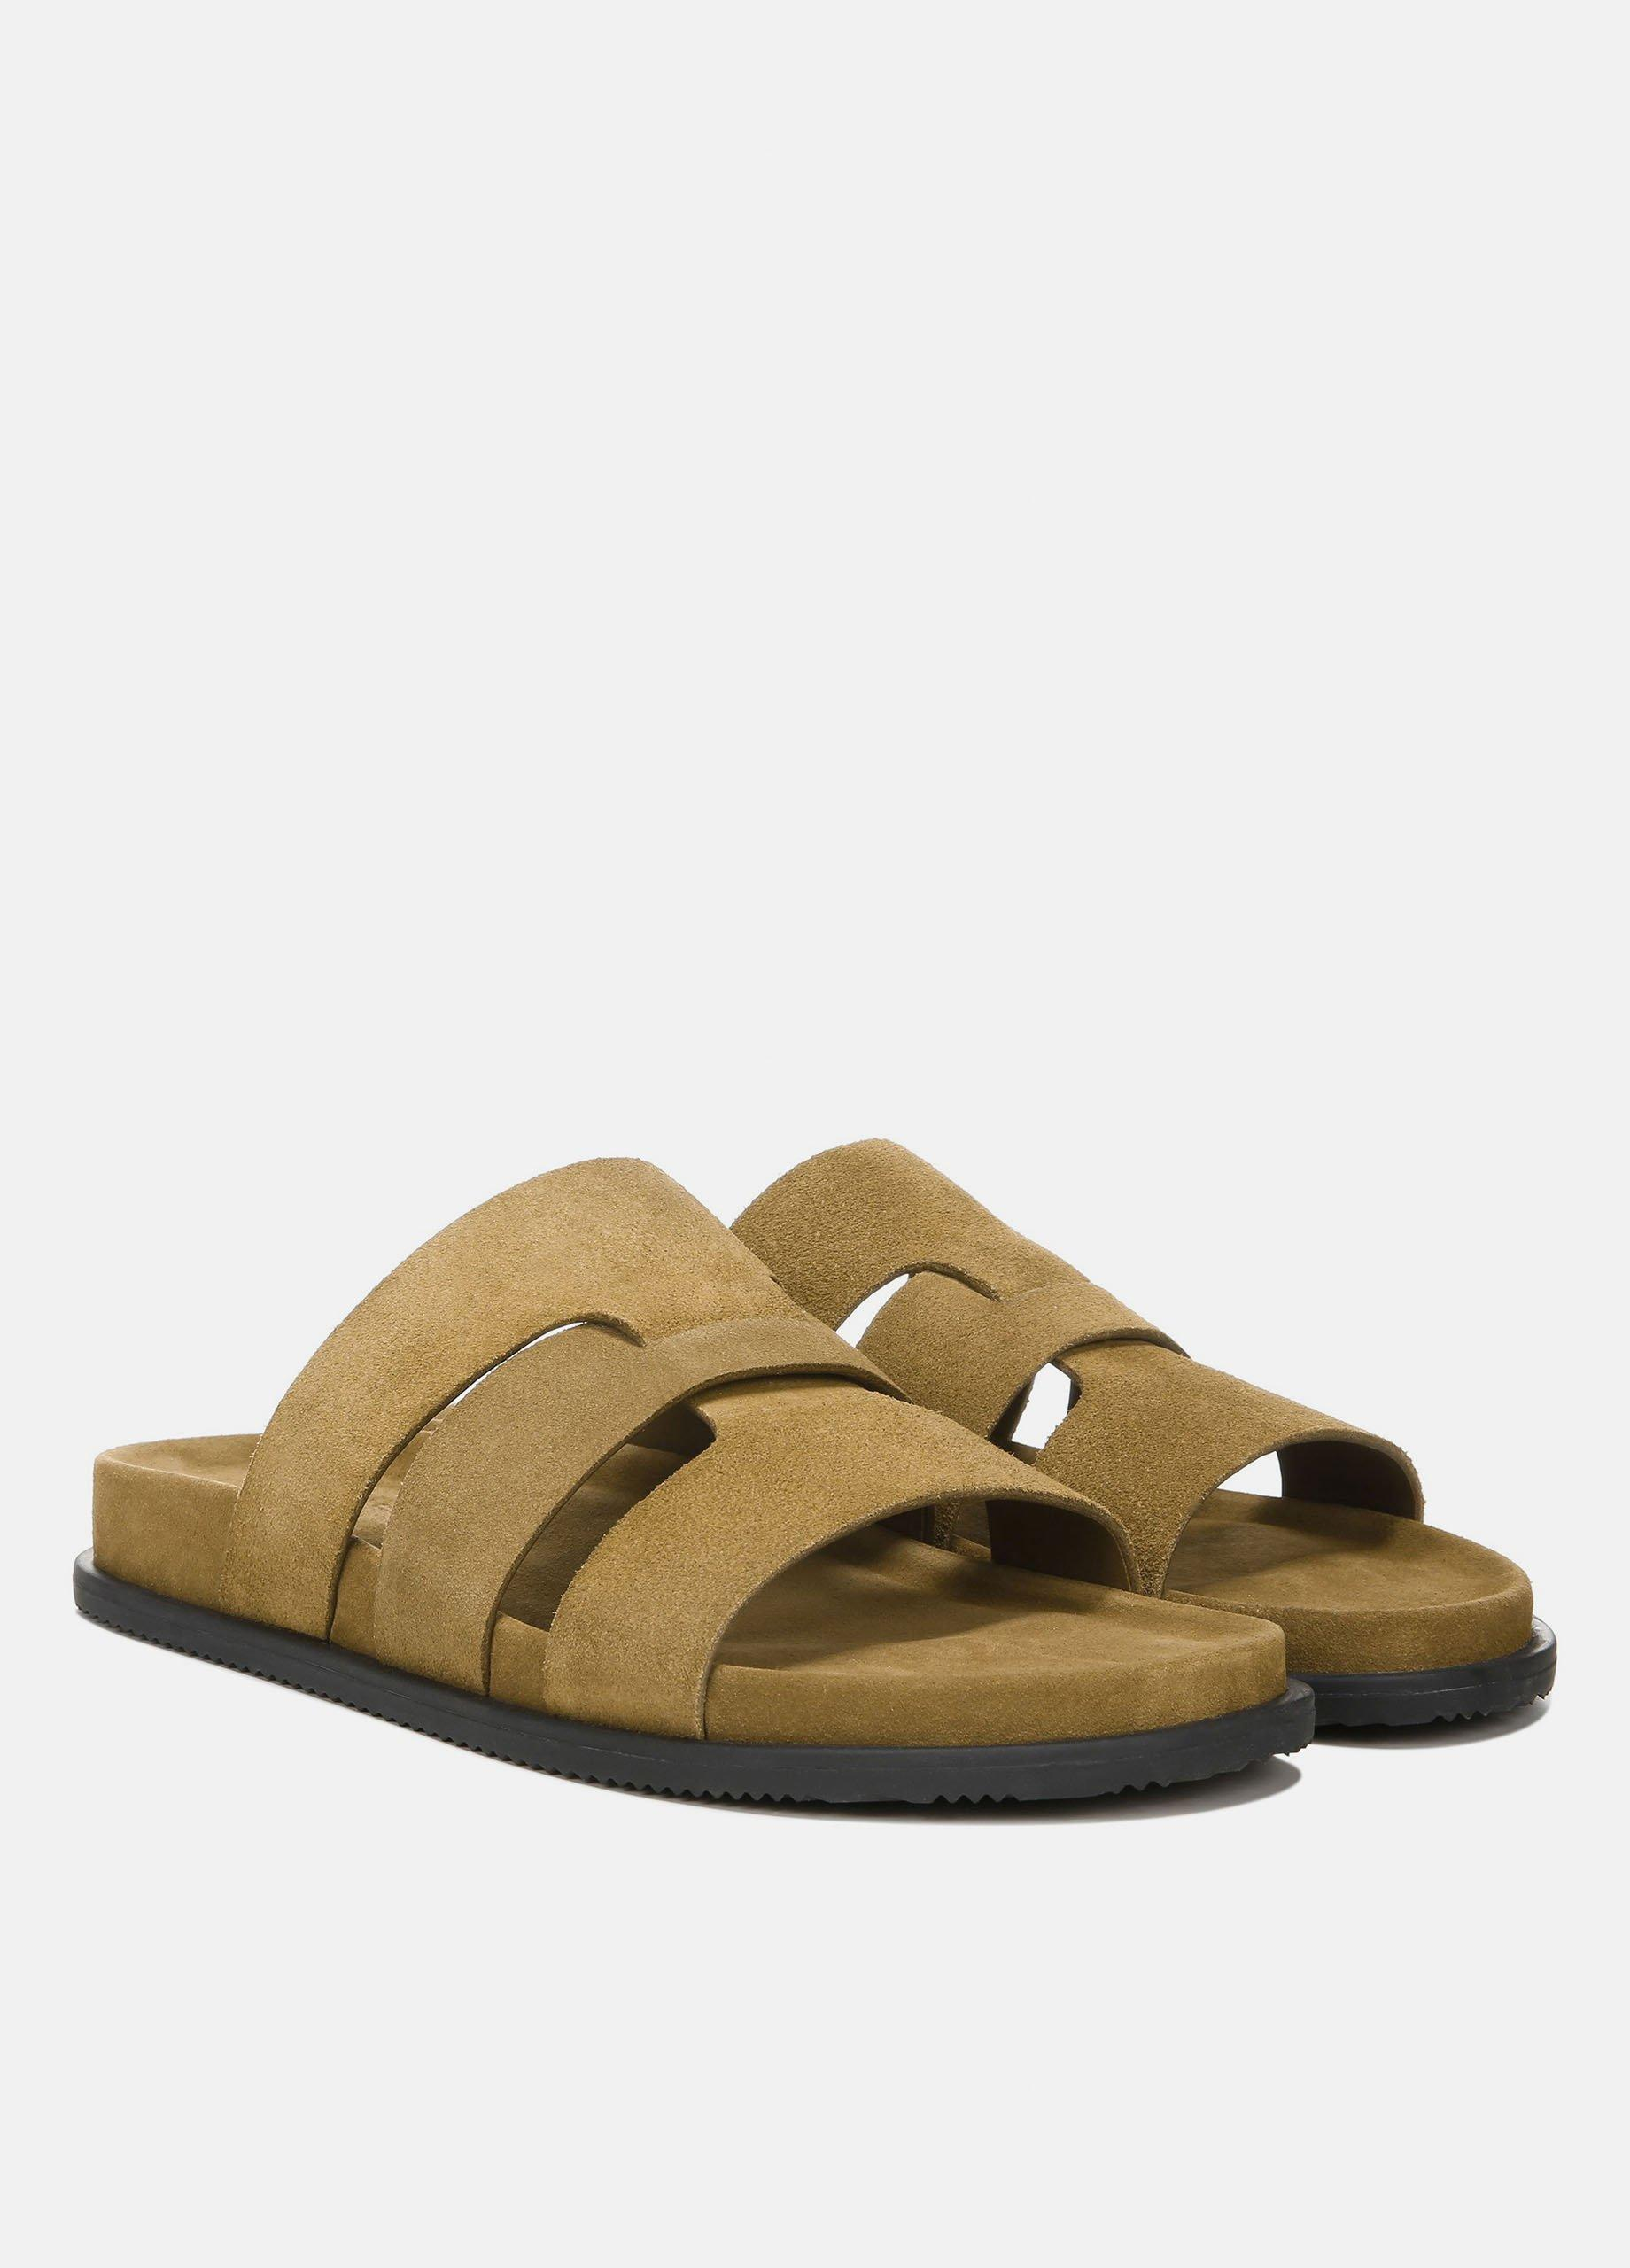 Dorsey Suede Sandal